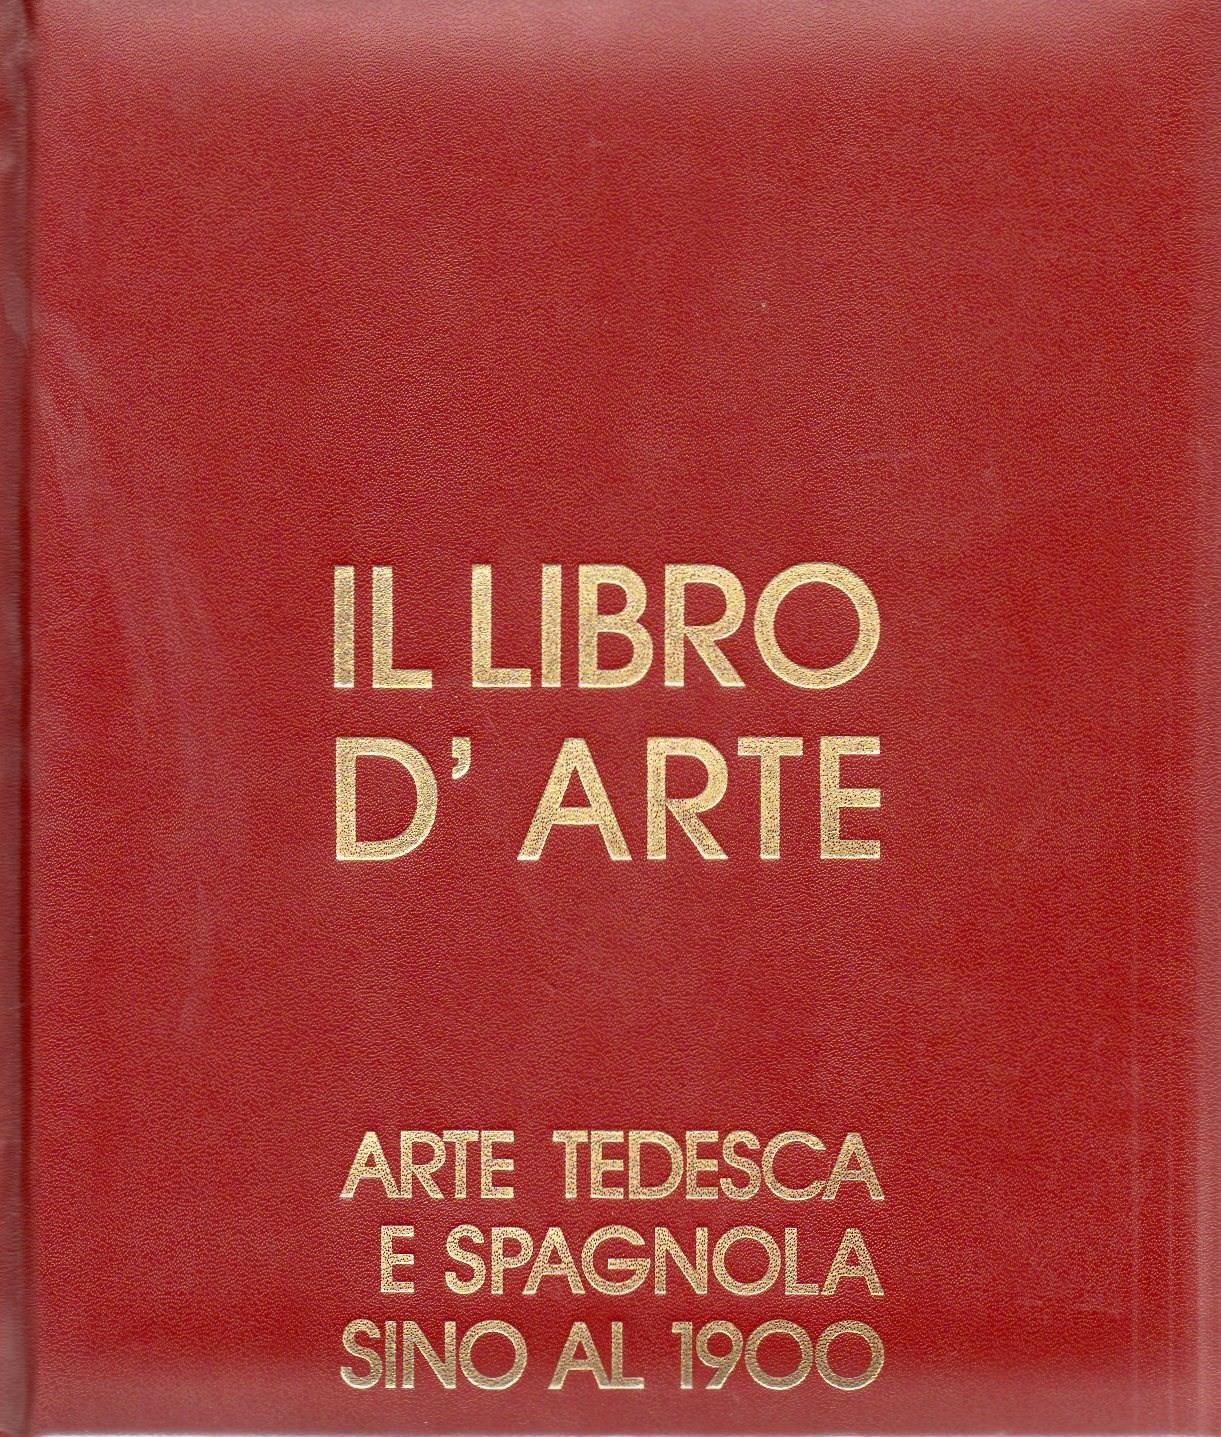 il libro d'arte - arte tedesca e spagnola sino al 1900